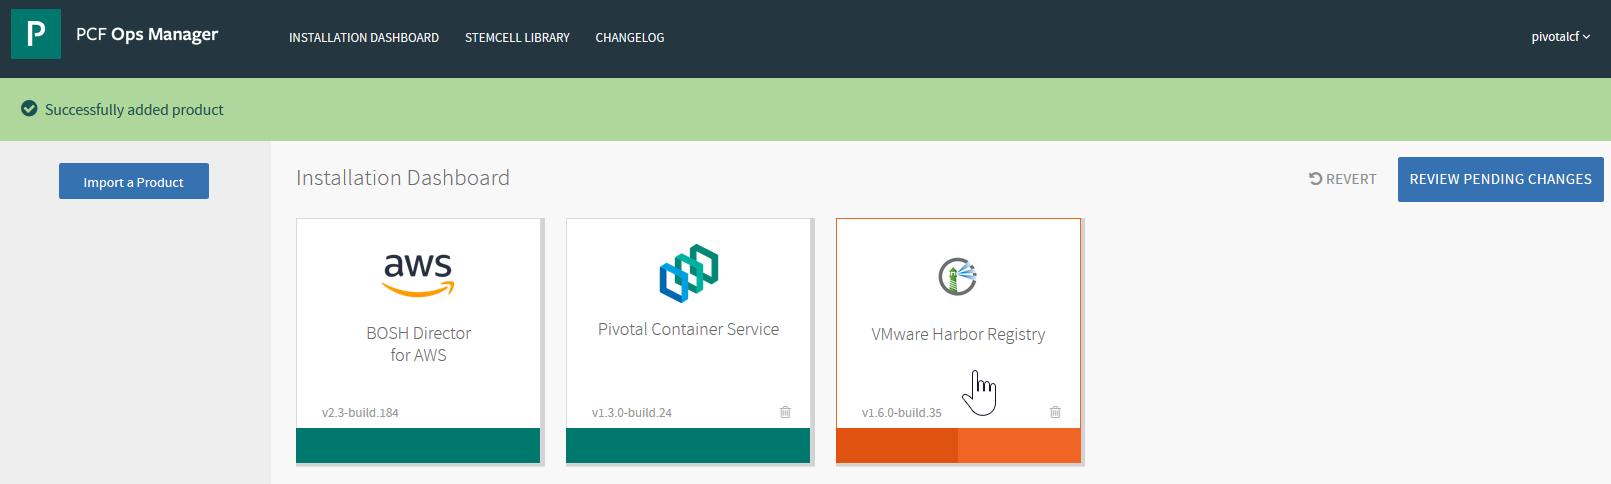 Installing and Configuring VMware Harbor Registry | Pivotal Partner Docs